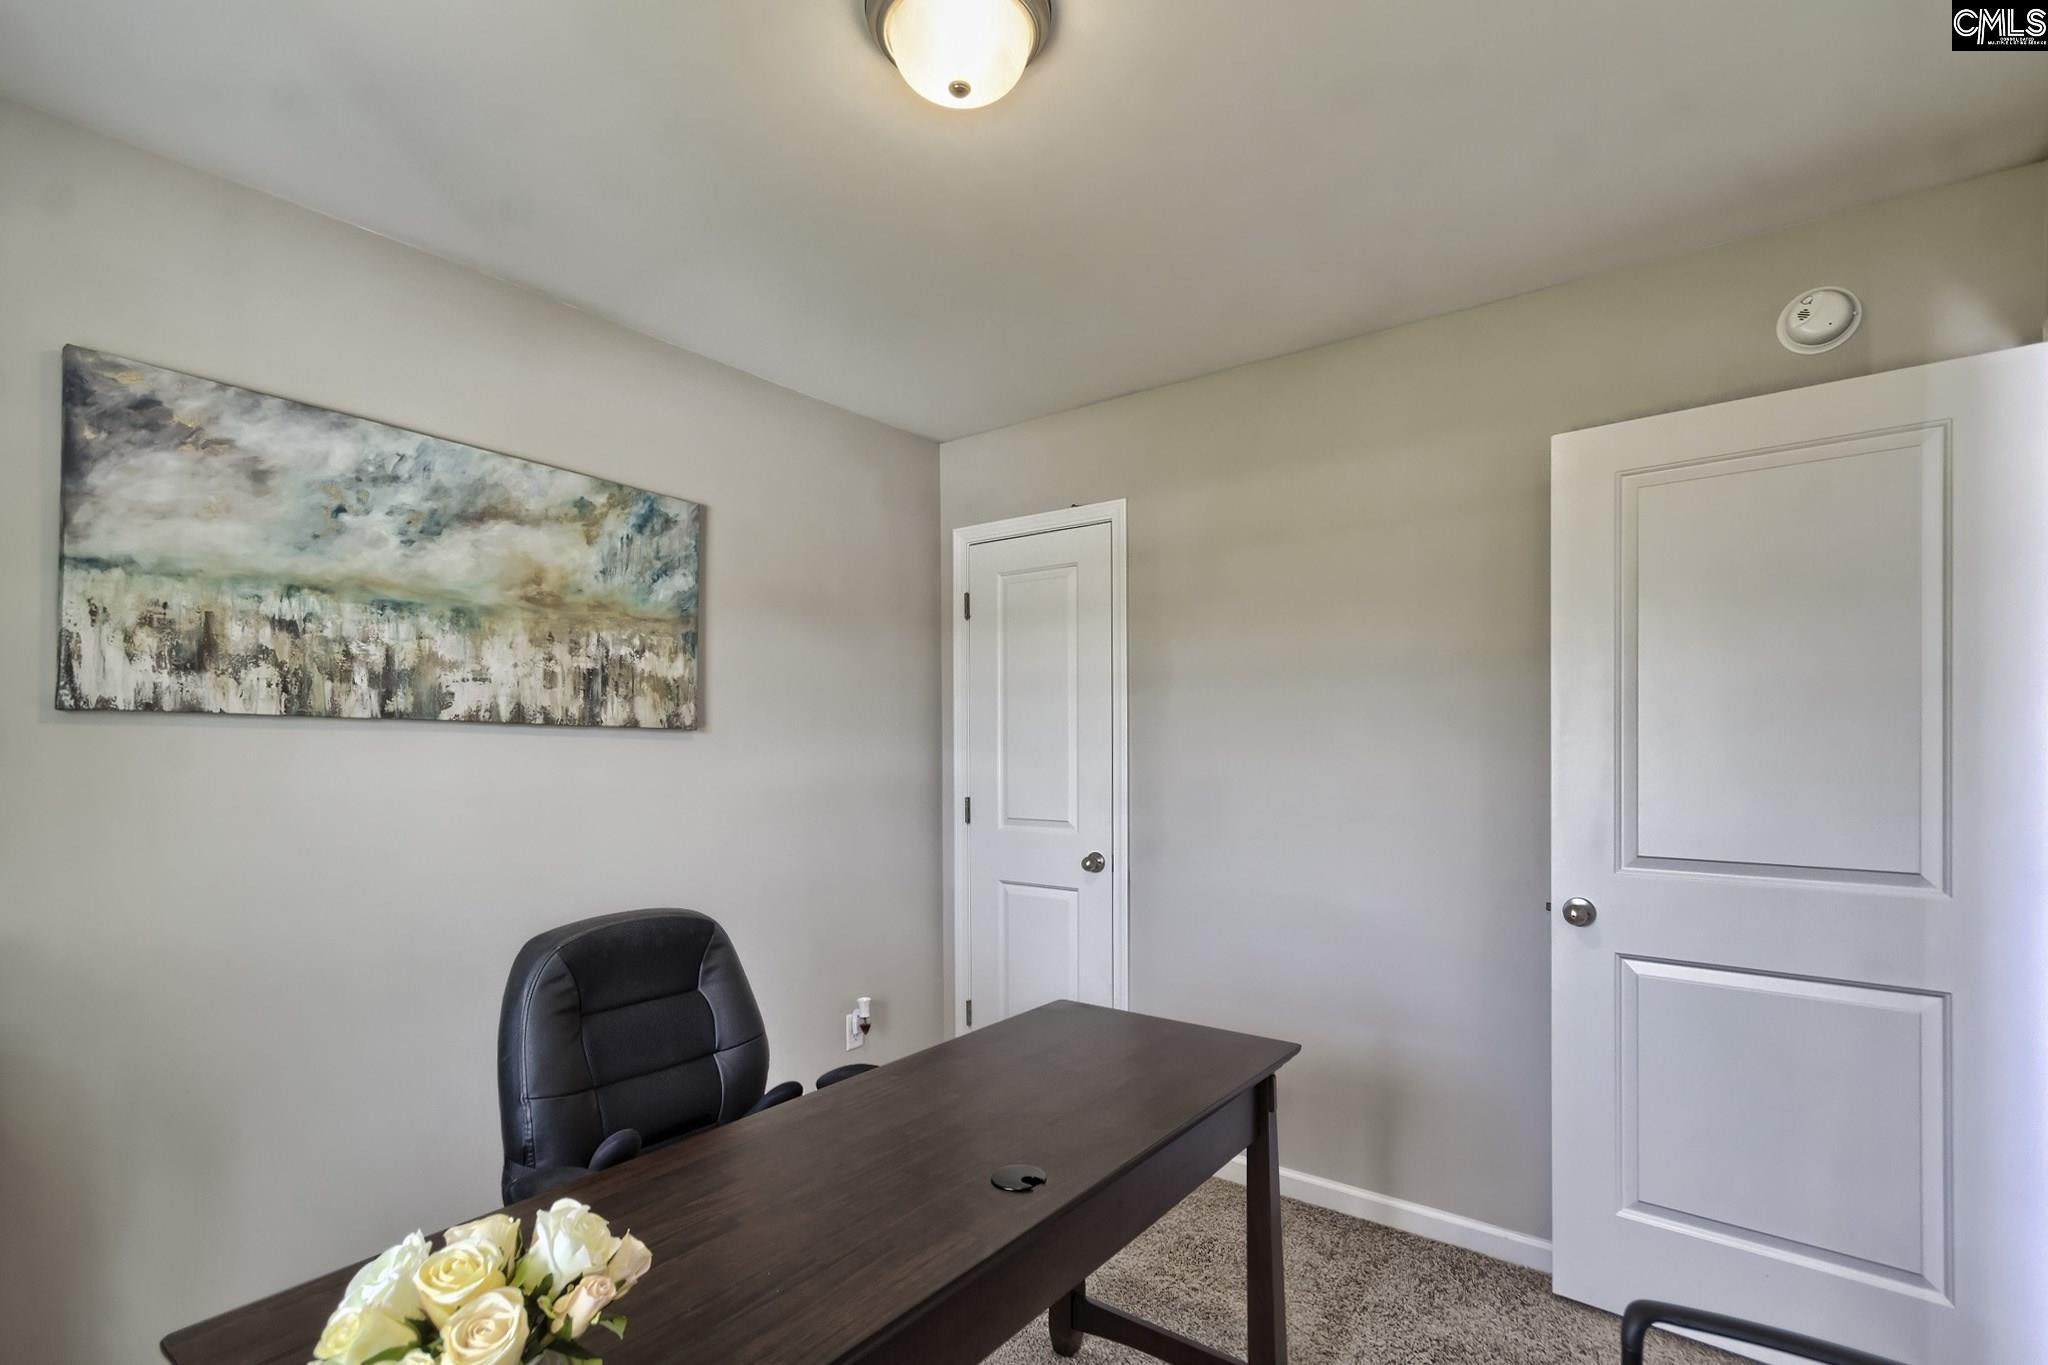 239 Drayton Hall (lot 47) West Columbia, SC 29172